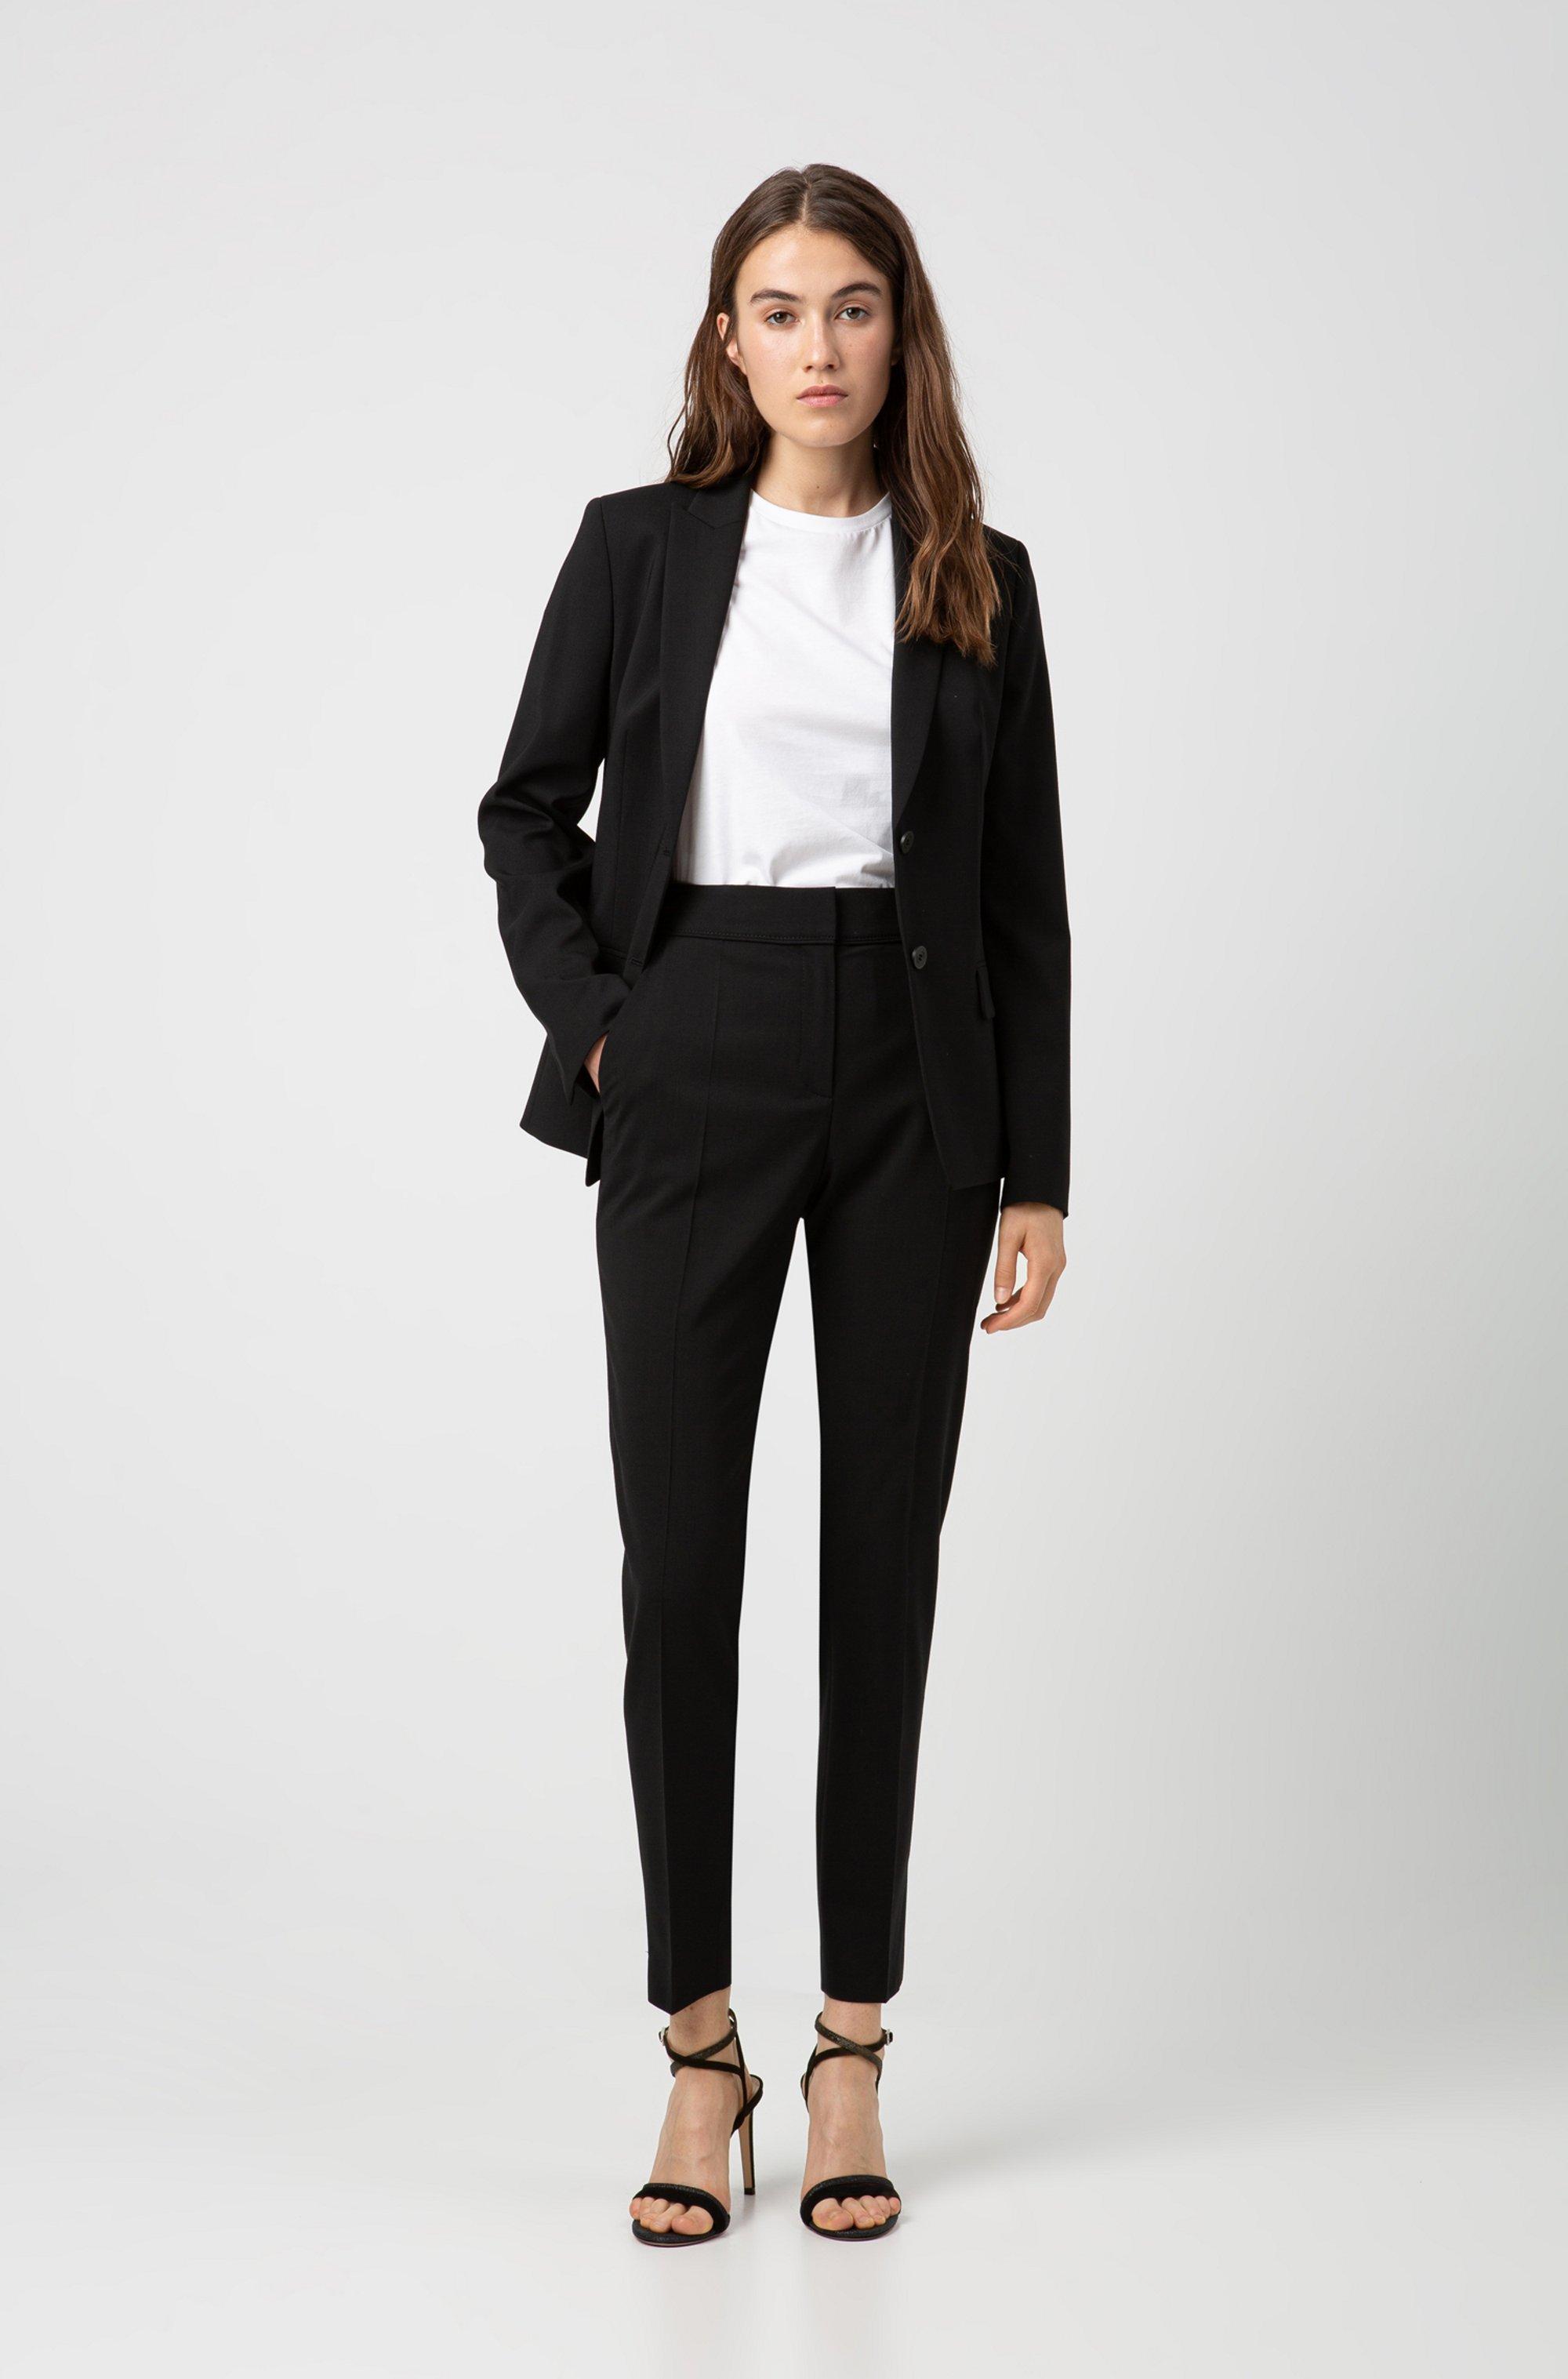 Pantalones regular fit tobilleros en lana virgen elástica